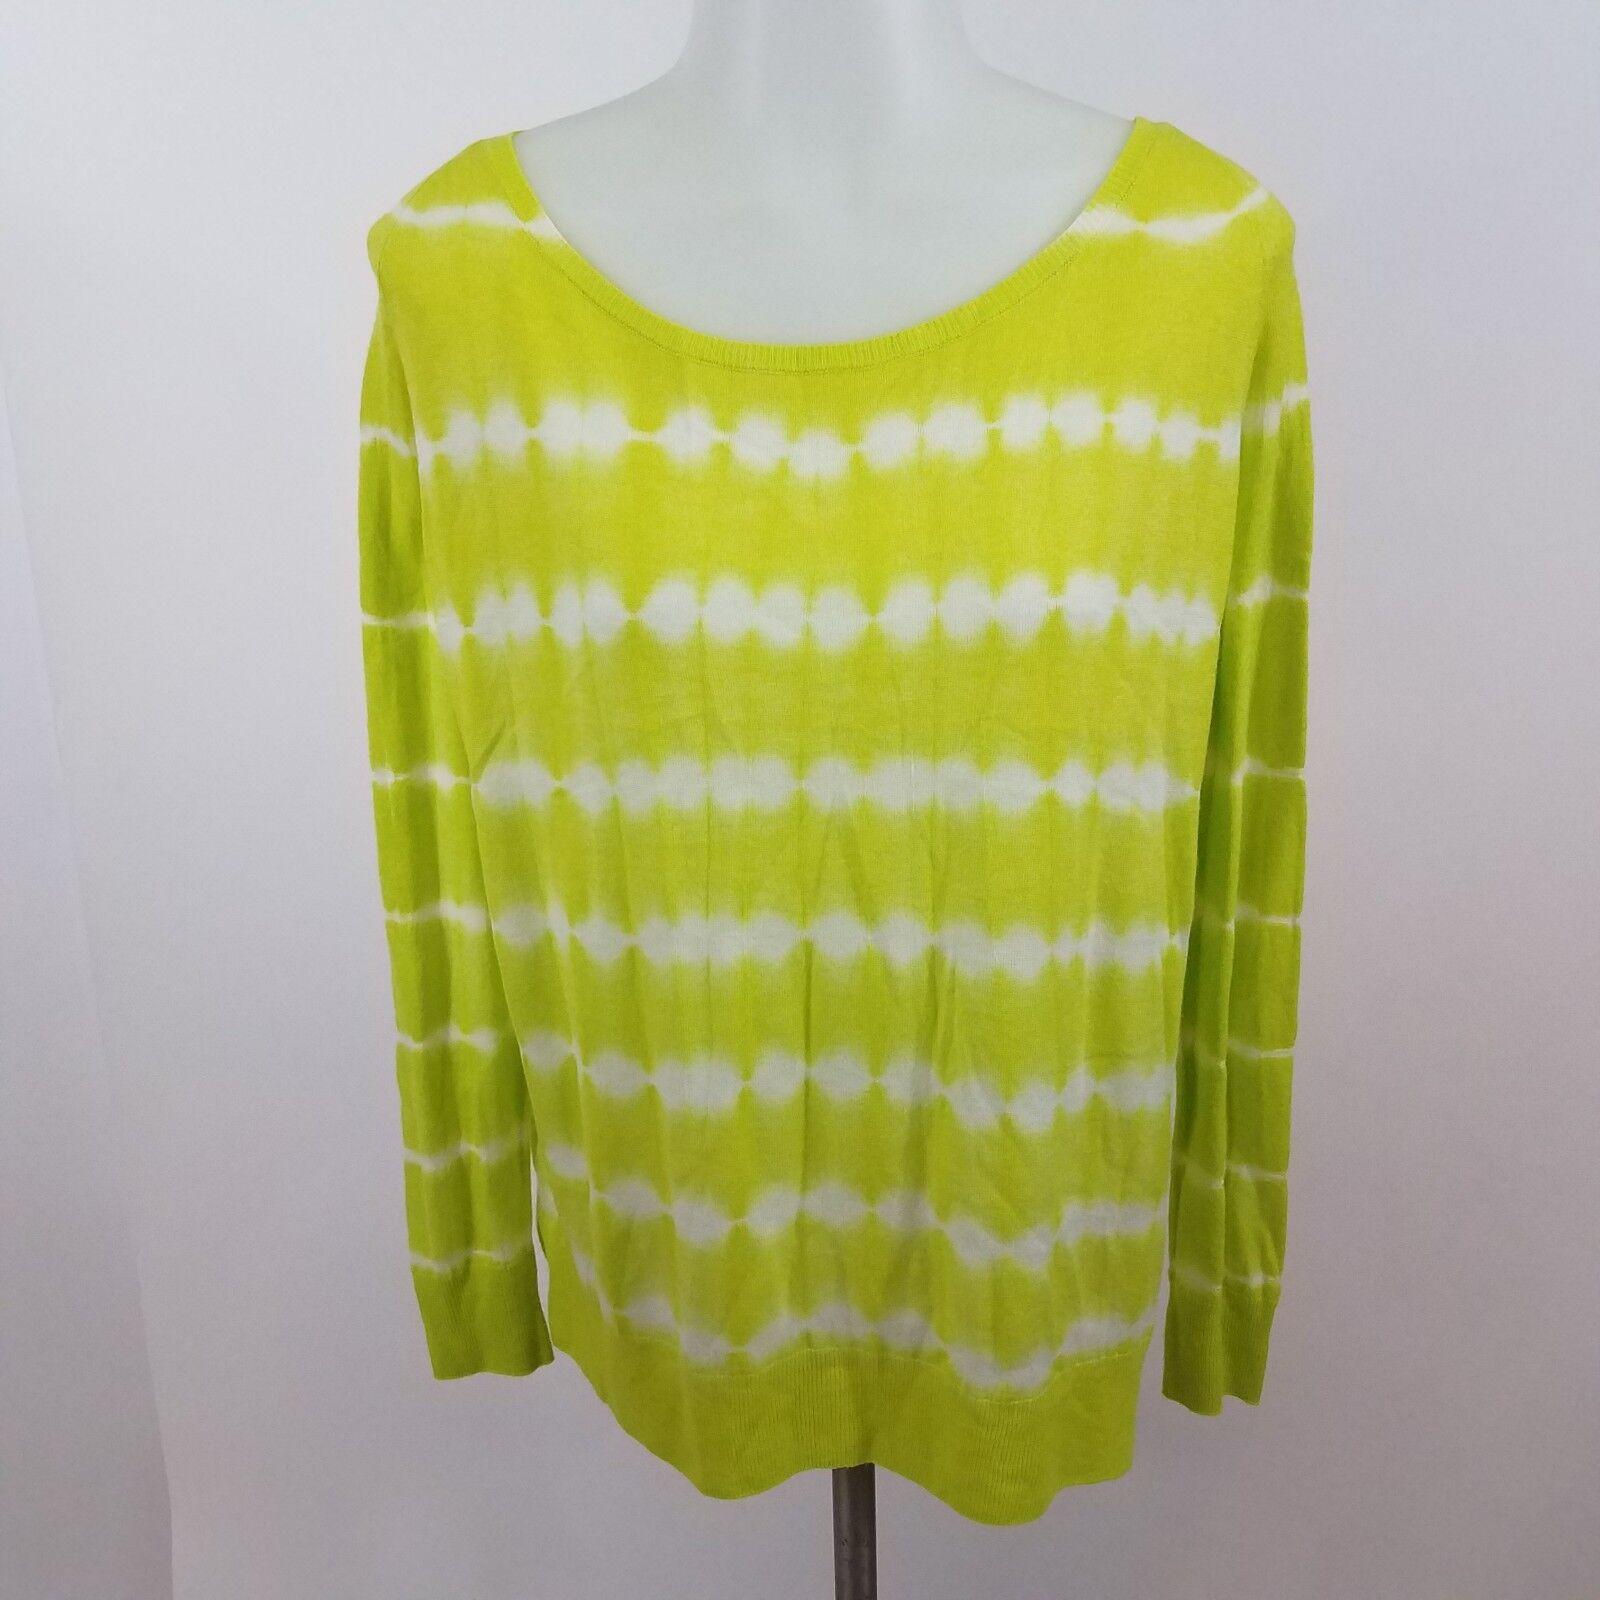 Joie sweater Emari Tie Dye Sweater Acid Lime Porcelain Porcelain Porcelain l s green white S  268 f77114